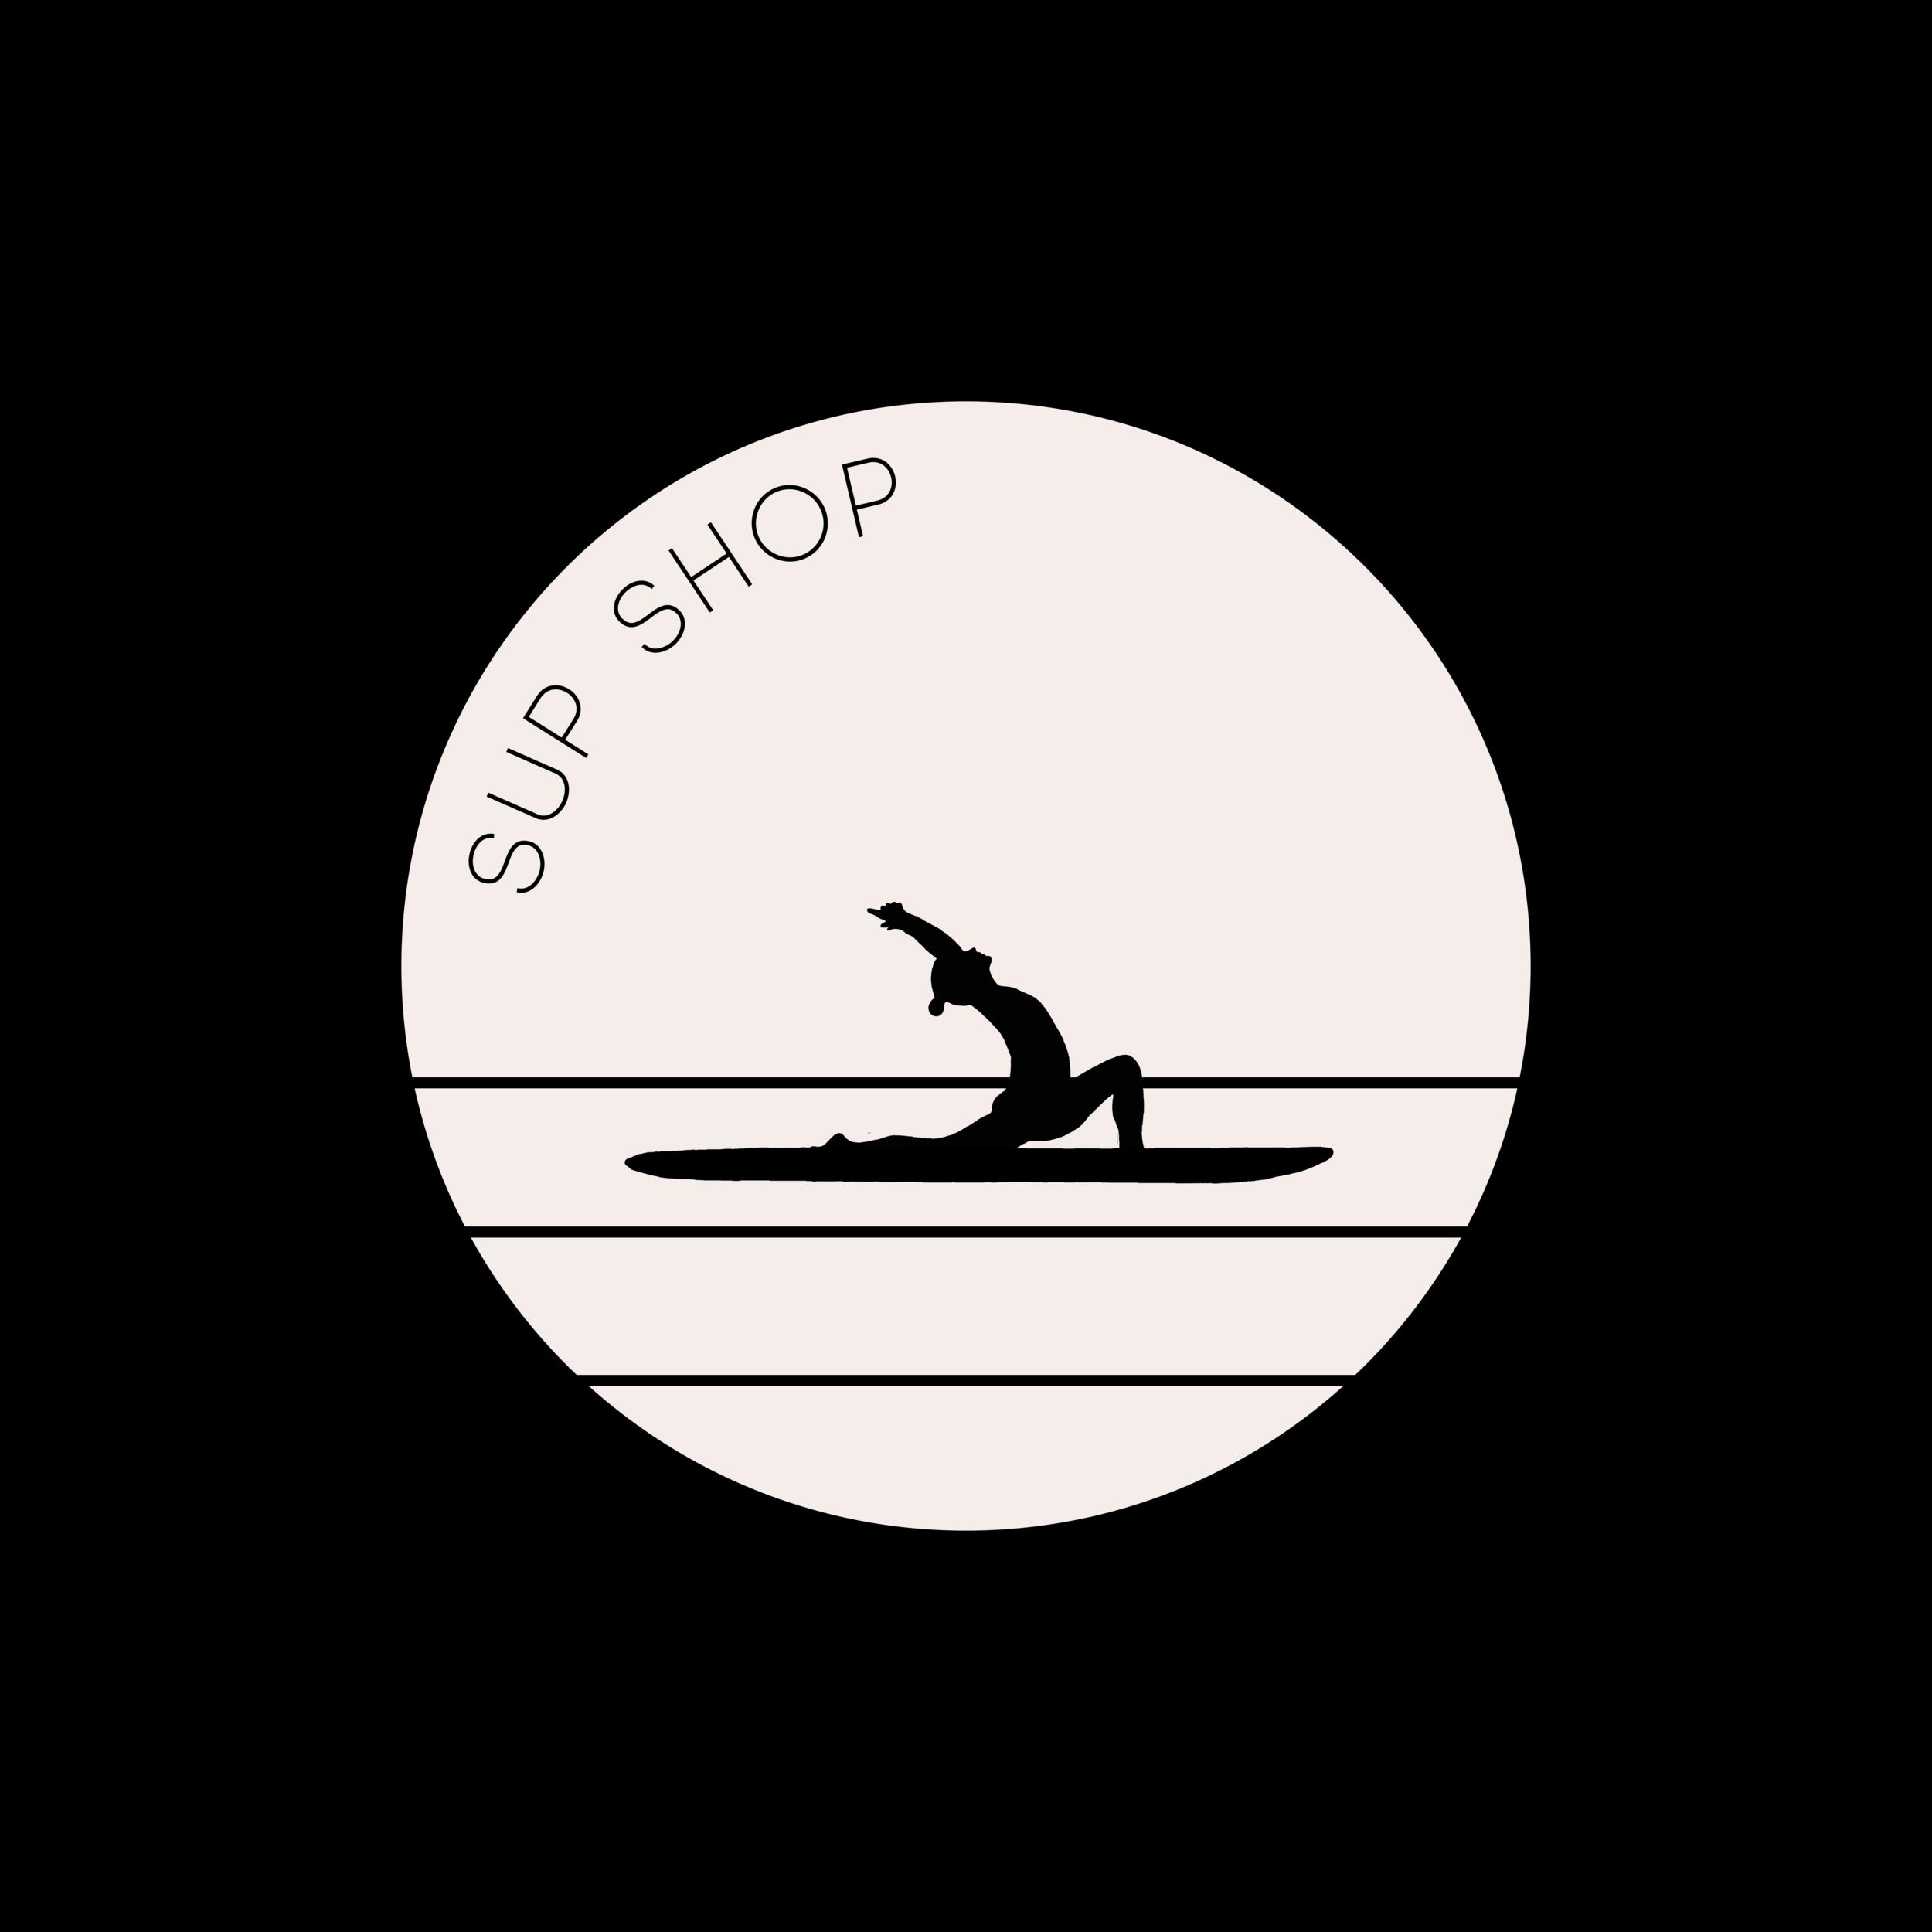 Logo_SUP SHOP_Submark nude tone.png